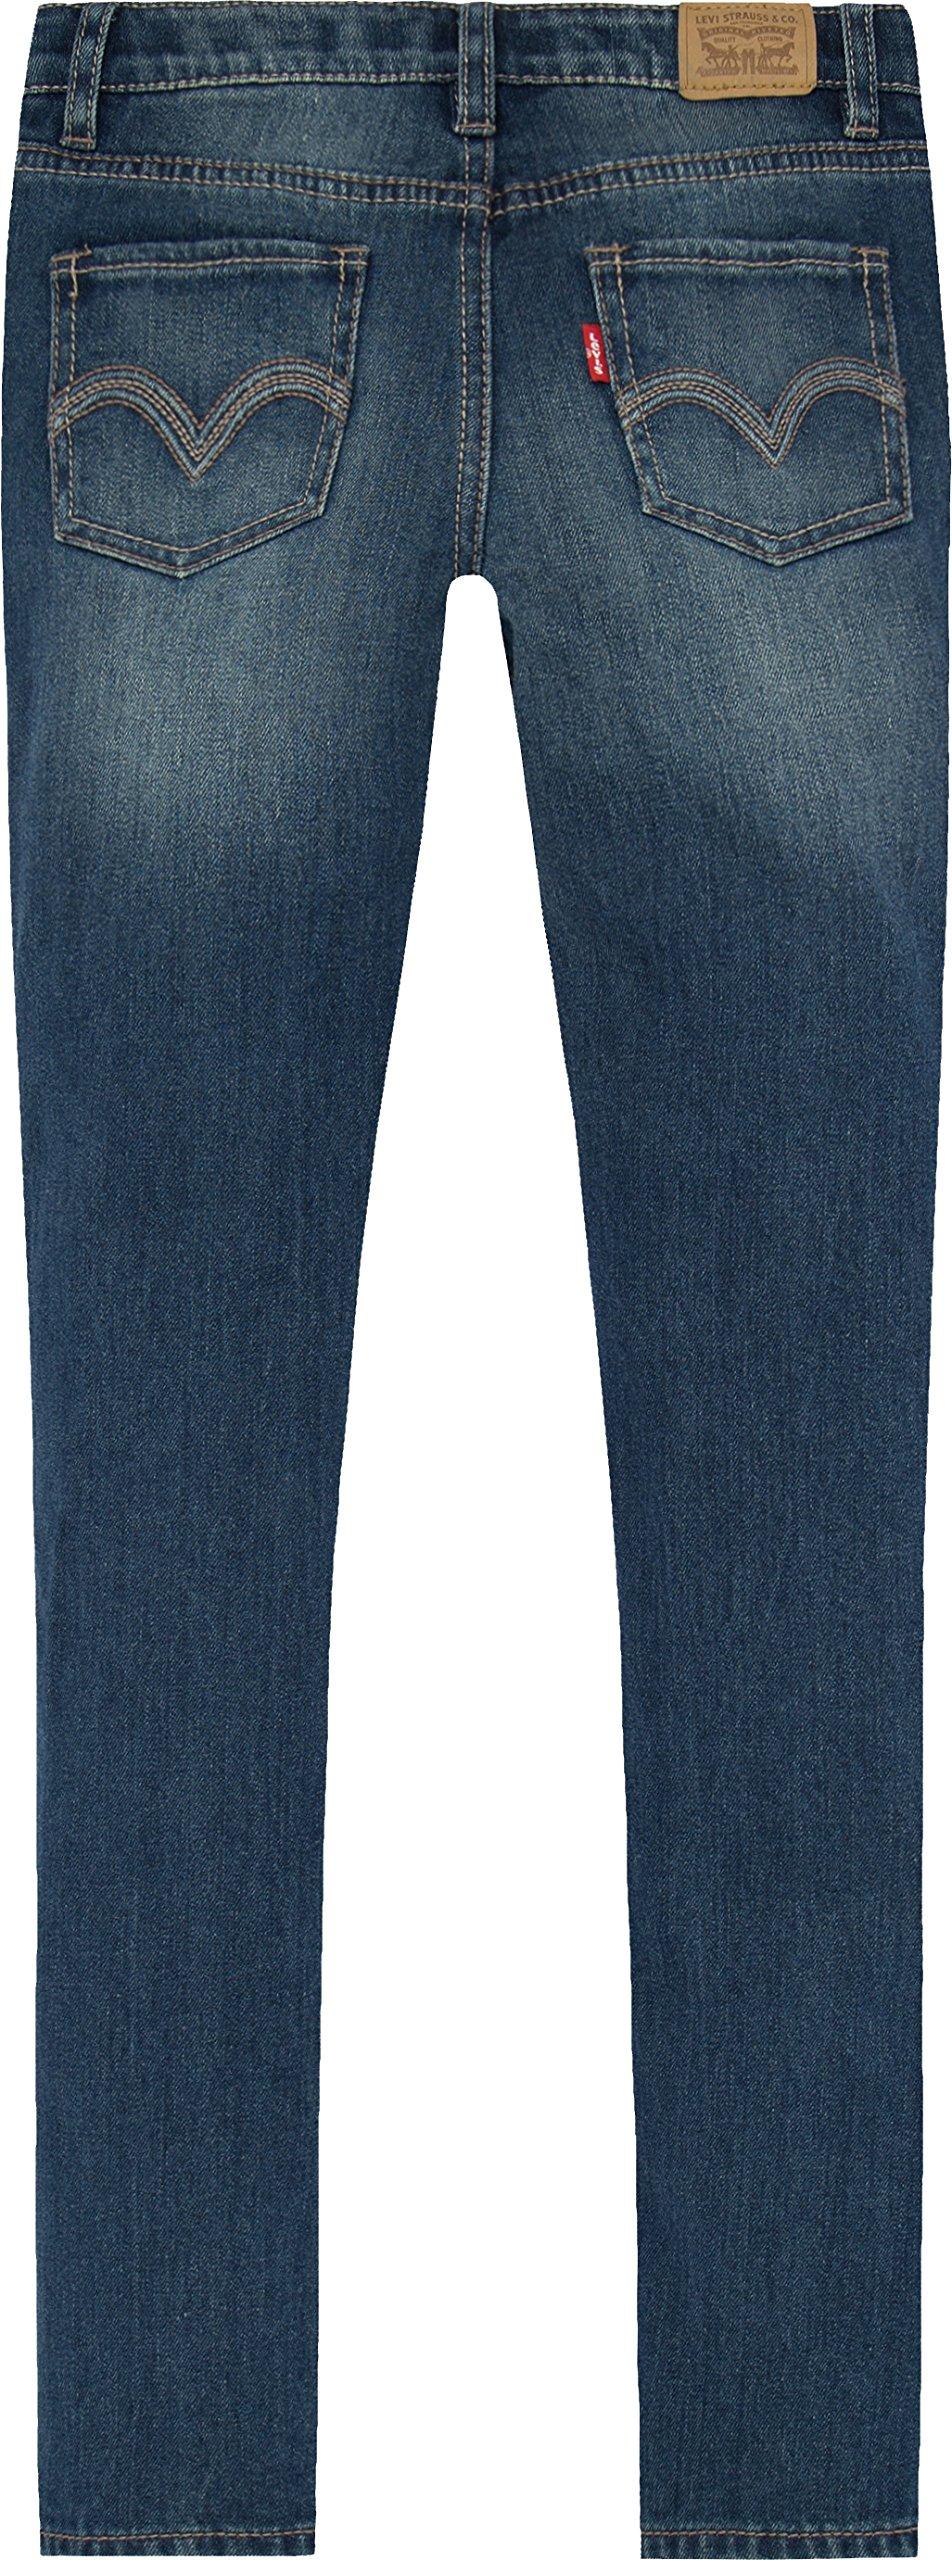 Levi's Girls' 711 Skinny Fit Jeans, Rockabilly, 16